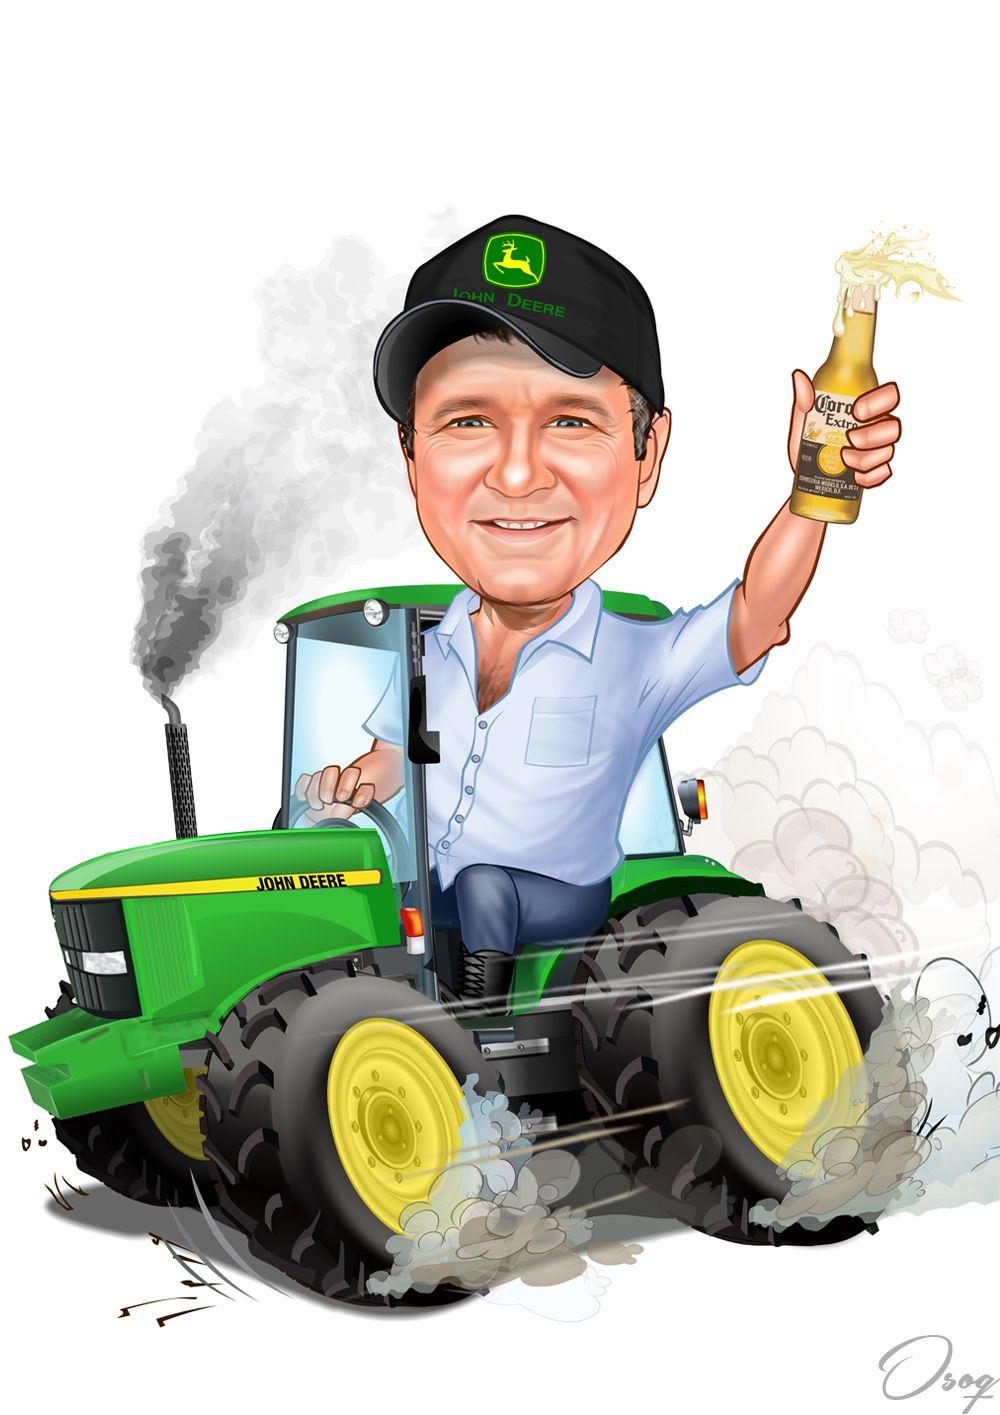 John Deere Undermining Black Farmers' Boycott, Org Says